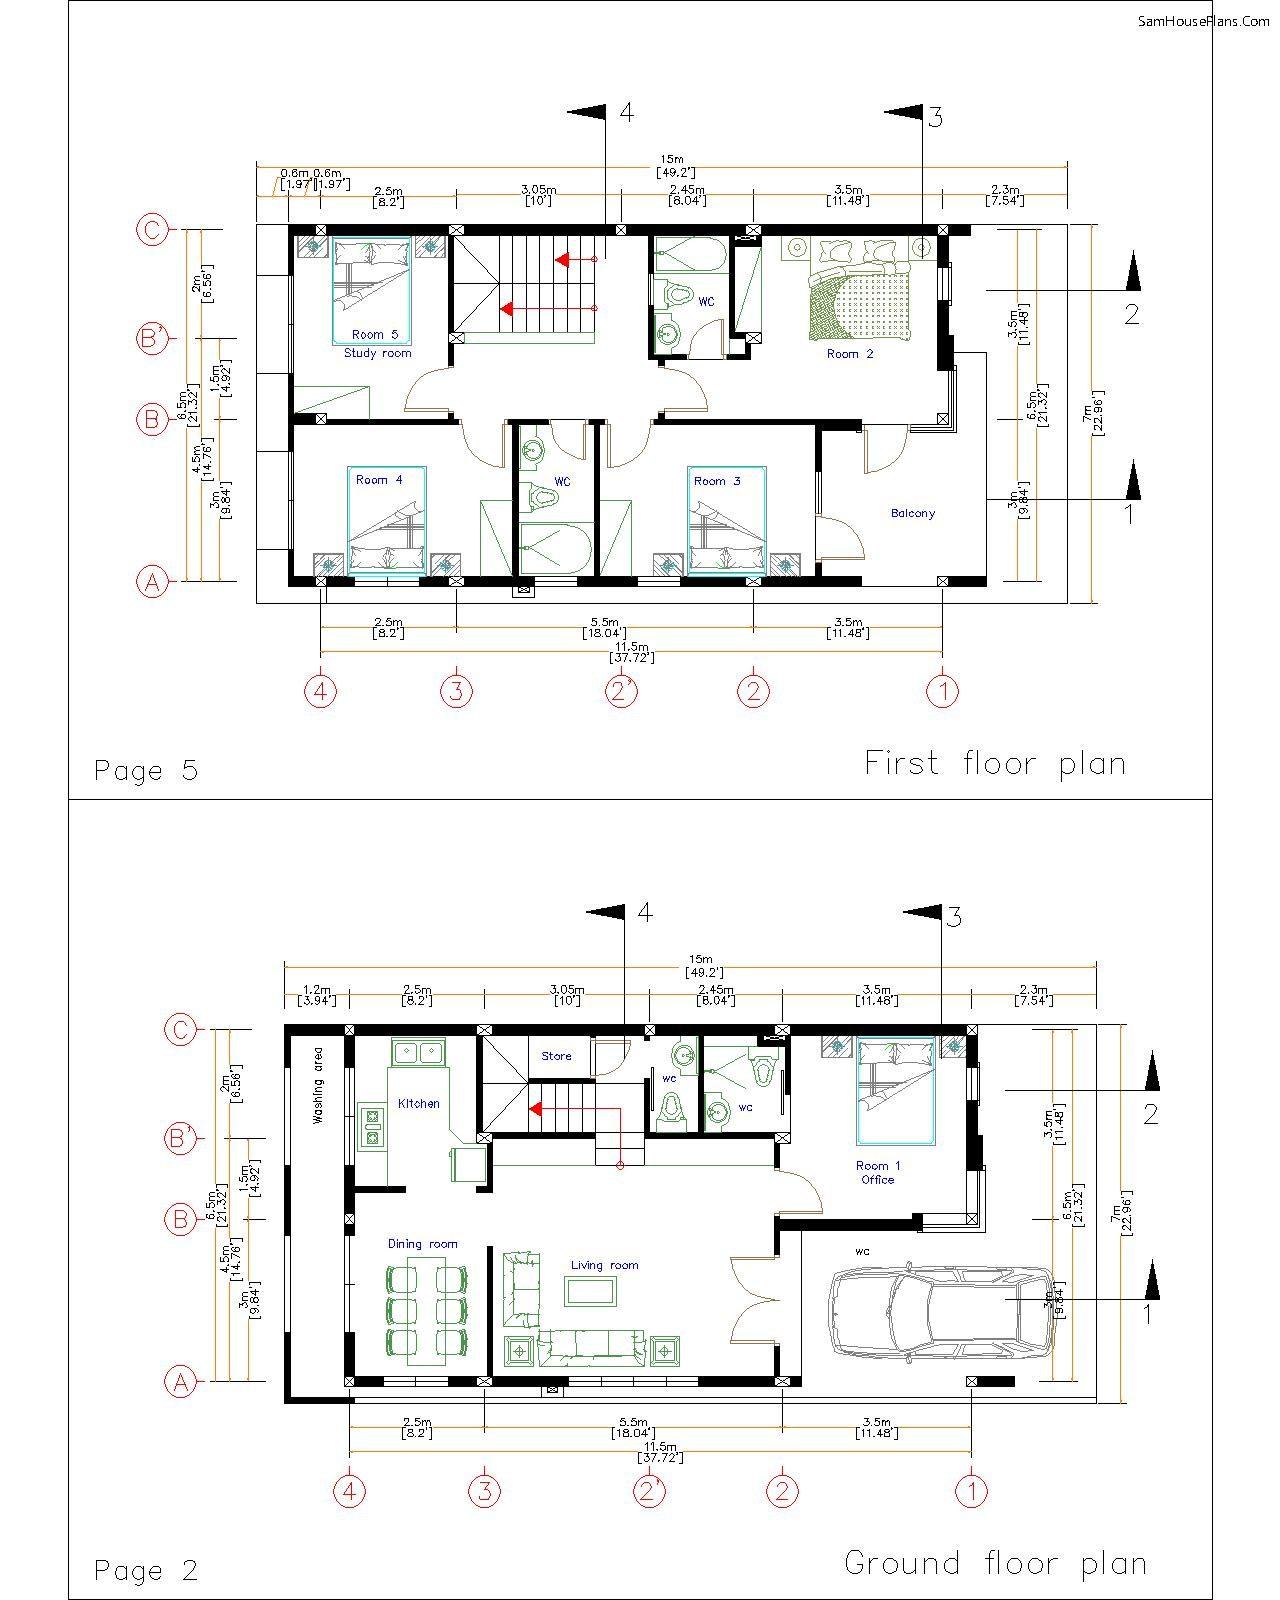 7x15m- layout floor plan